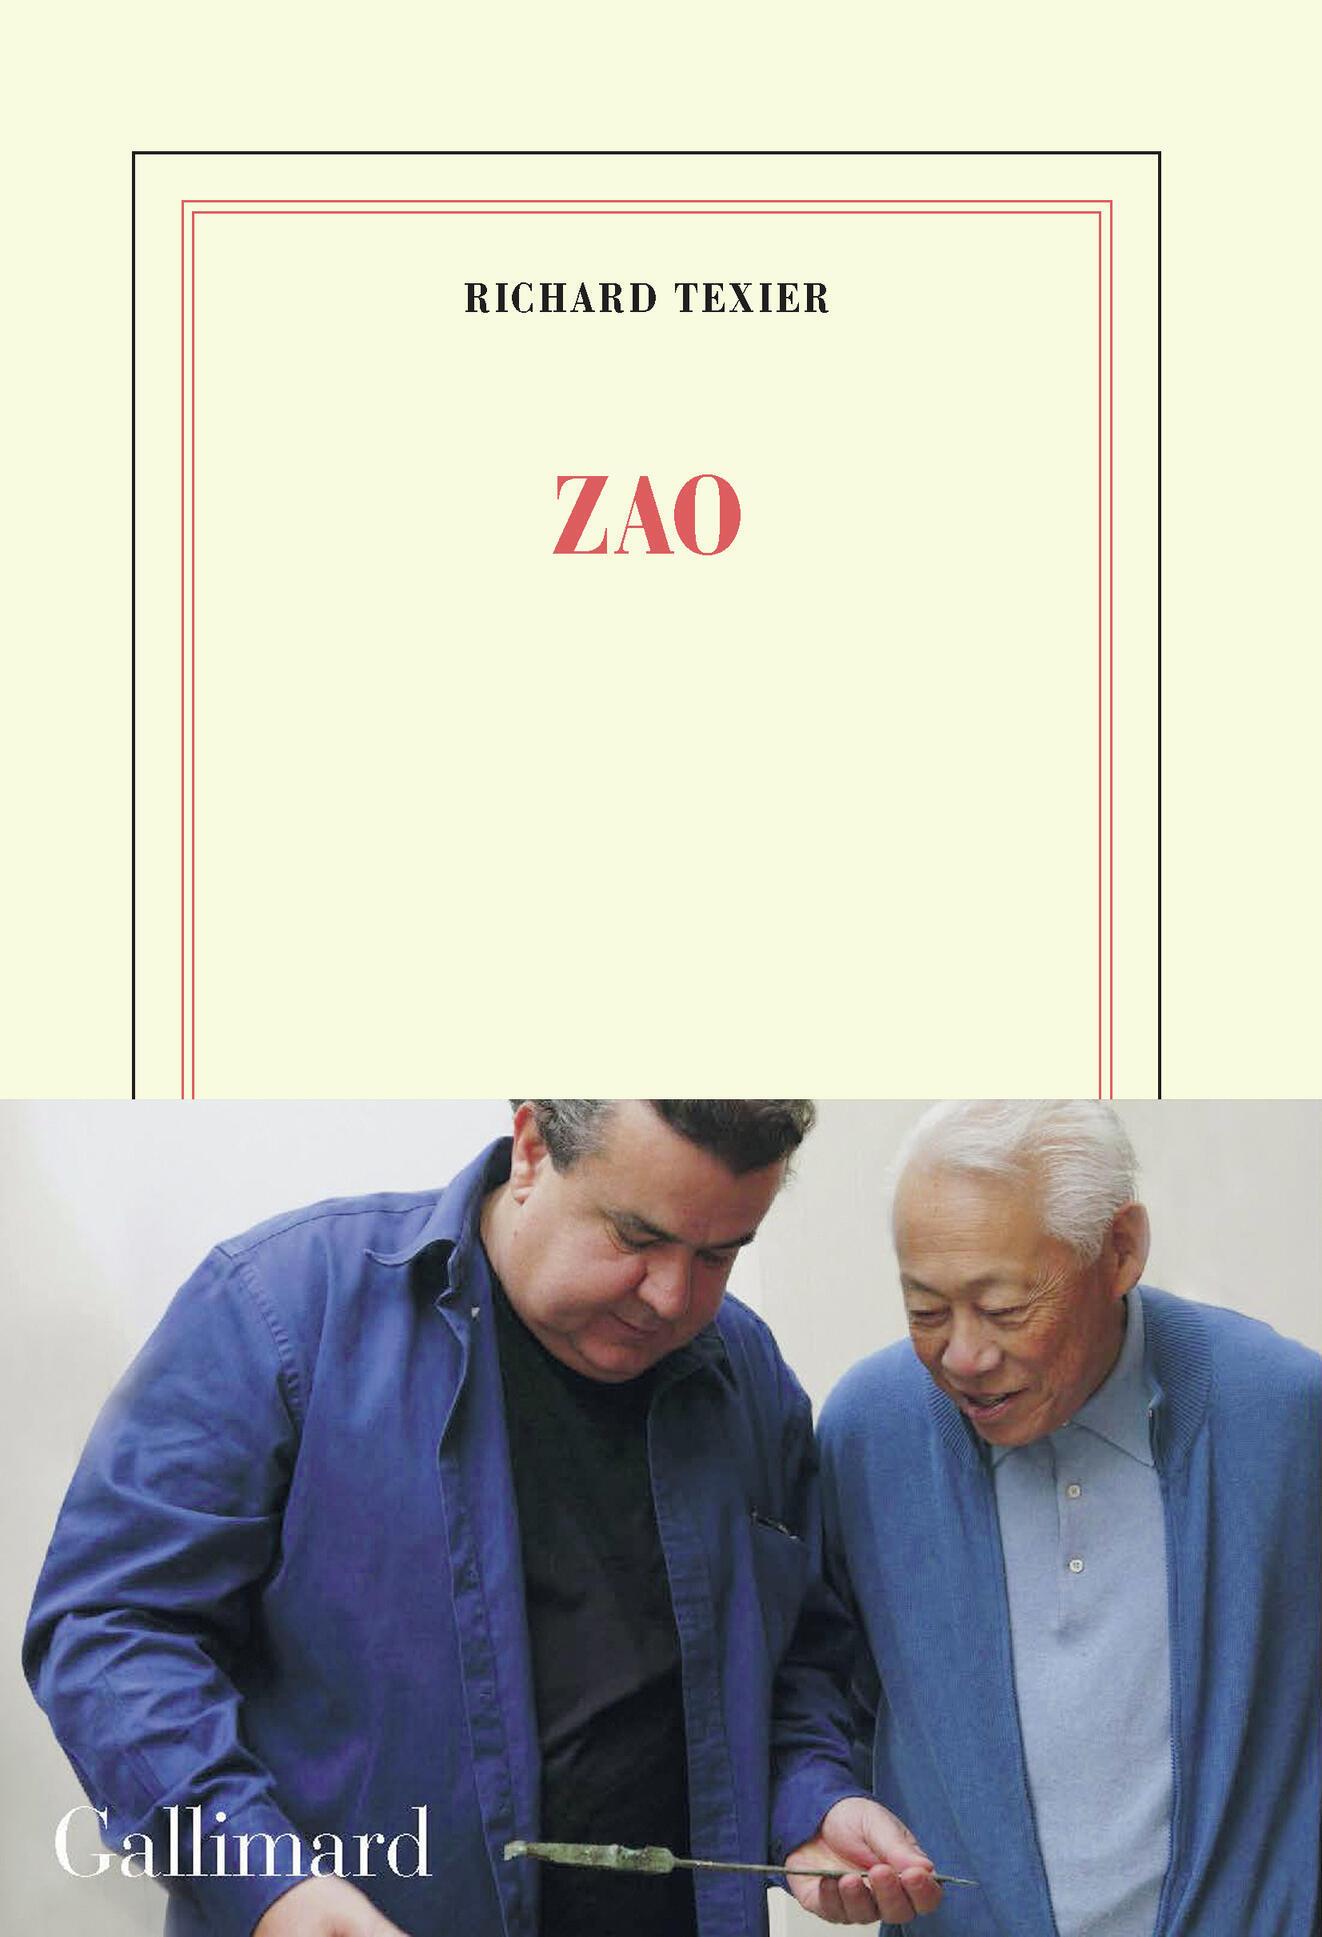 Zao- RICHARD TEXIER